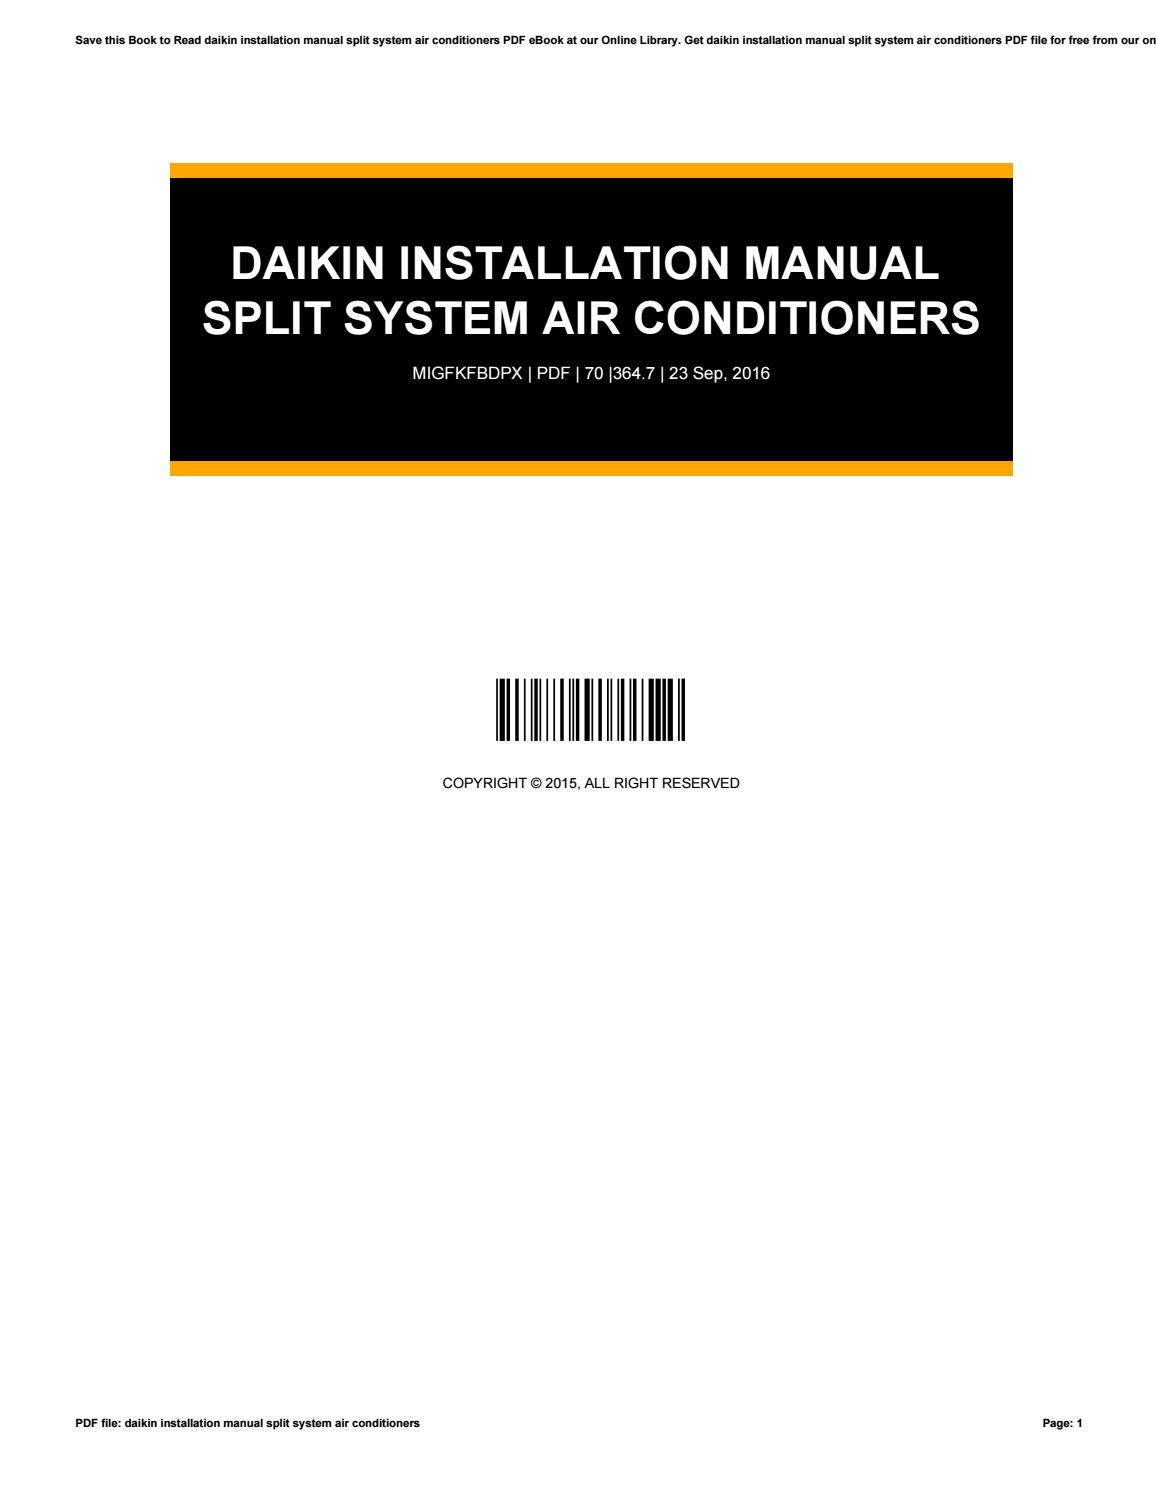 daikin split system installation manual